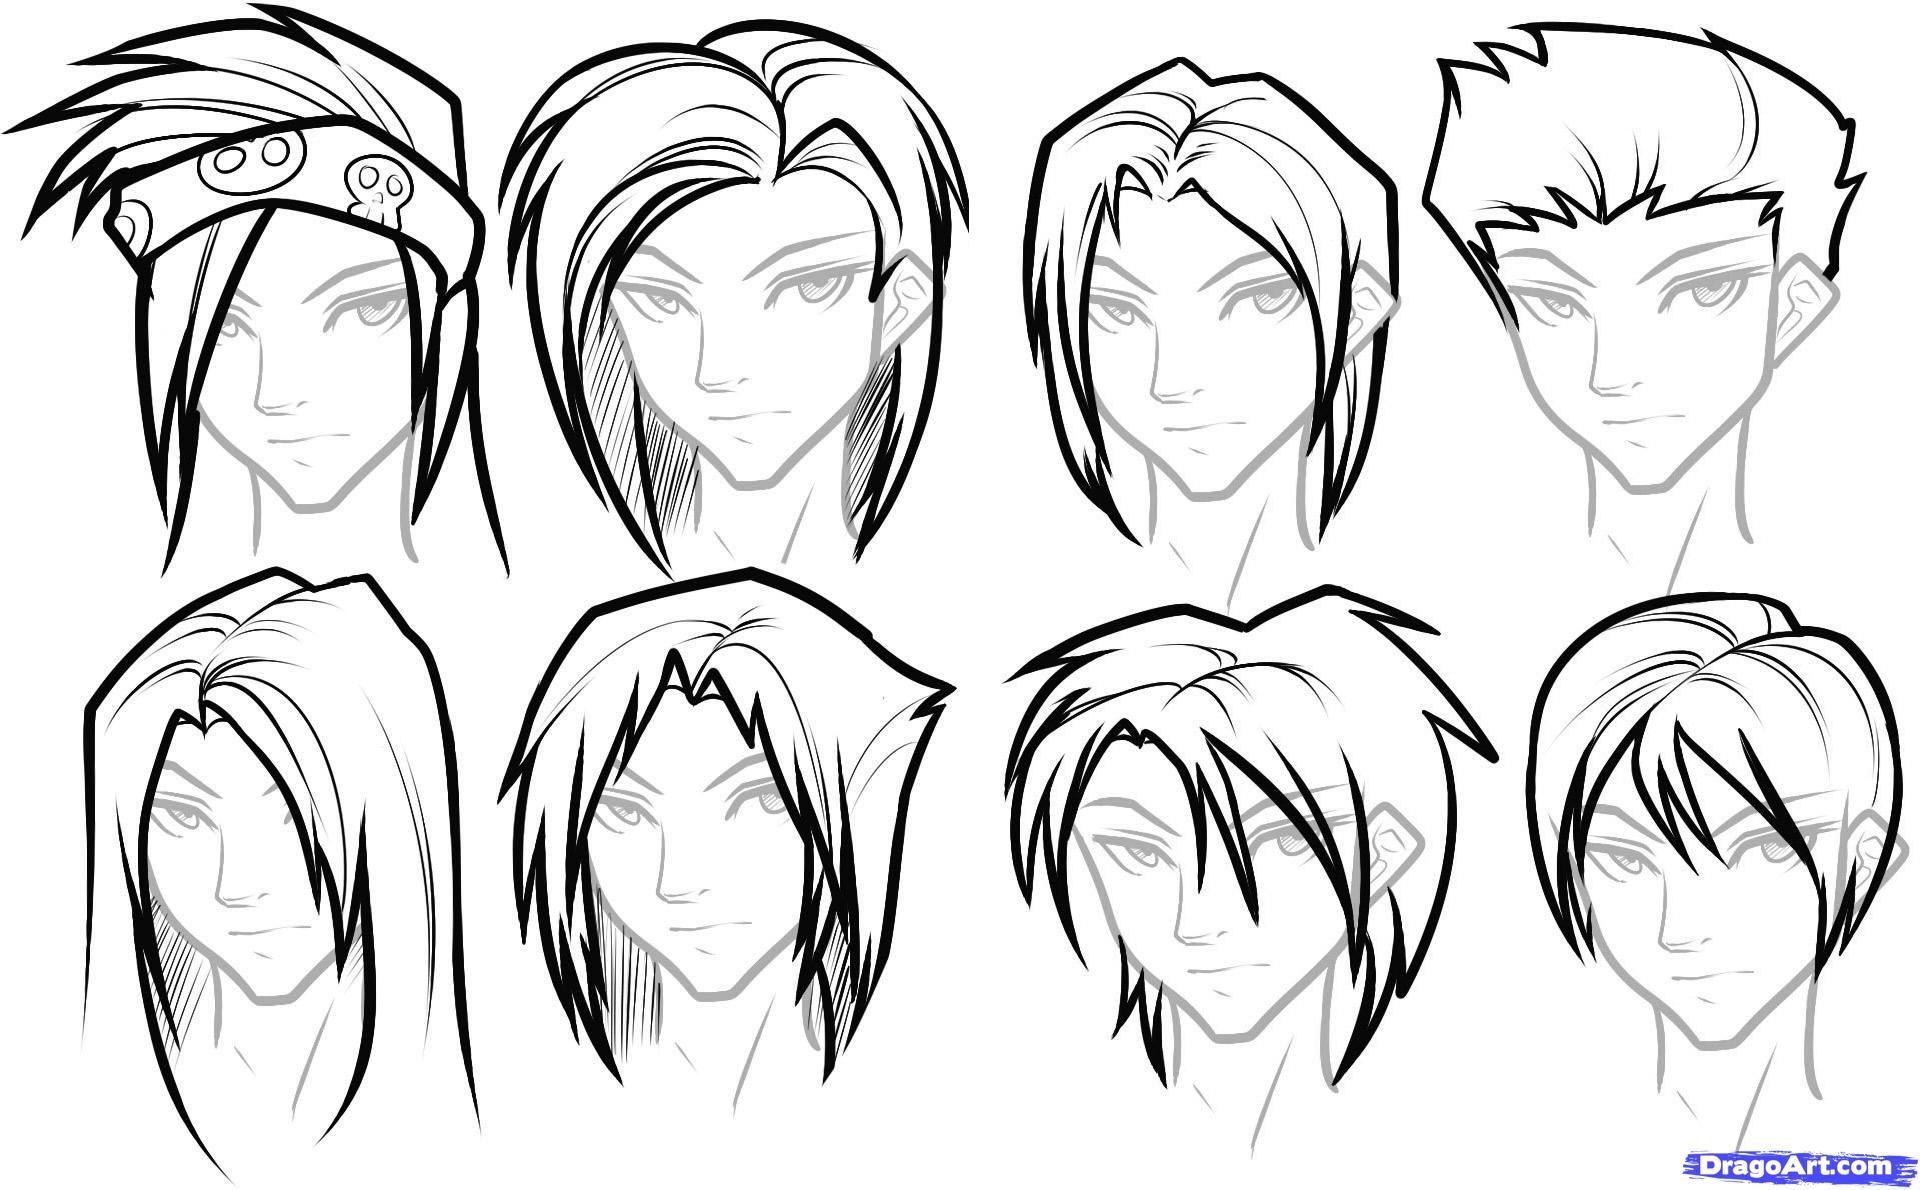 How To Draw Hair For Boys Step 14 Anime Boy Hair Anime Drawings